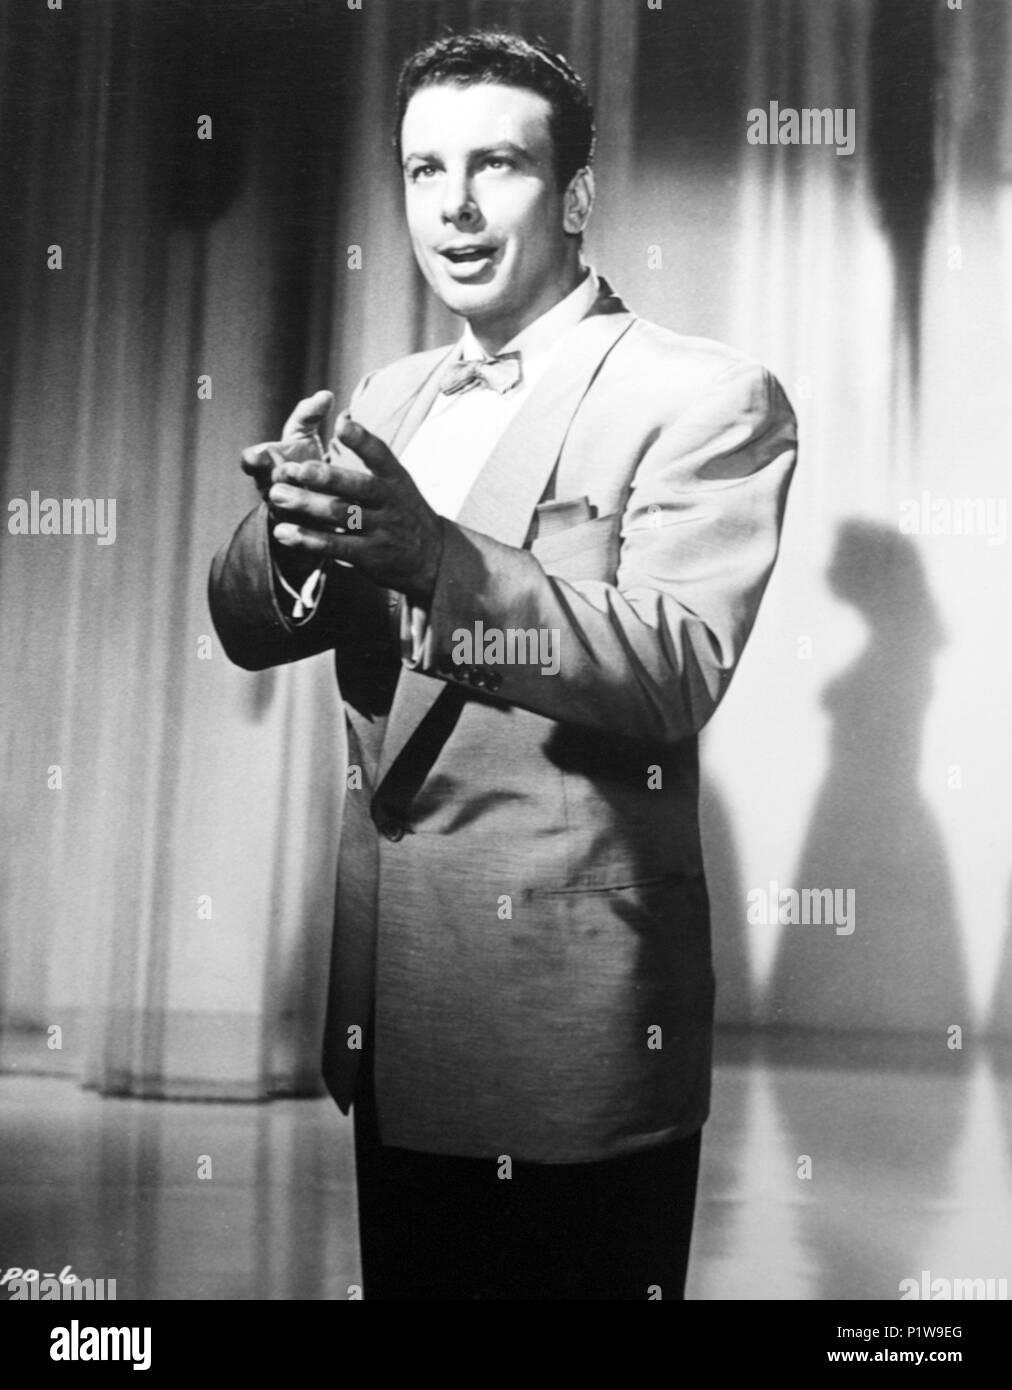 Original Film Title: BING PRESENTS ORESTE.  English Title: BING PRESENTS ORESTE.  Film Director: EDWARD DMYTRYK.  Year: 1956. Credit: PARAMOUNT PICTURES / Album - Stock Image